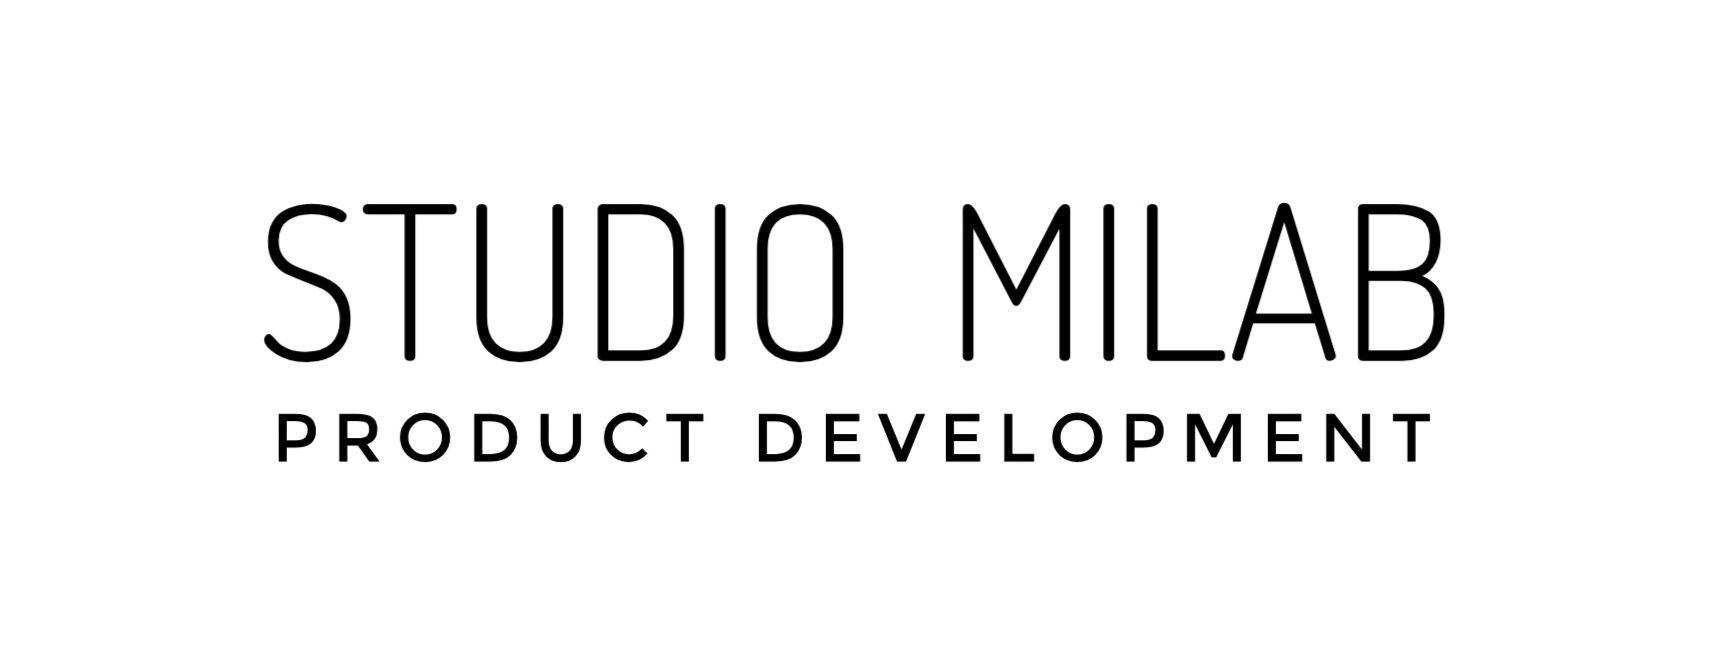 STUDIO MILAB